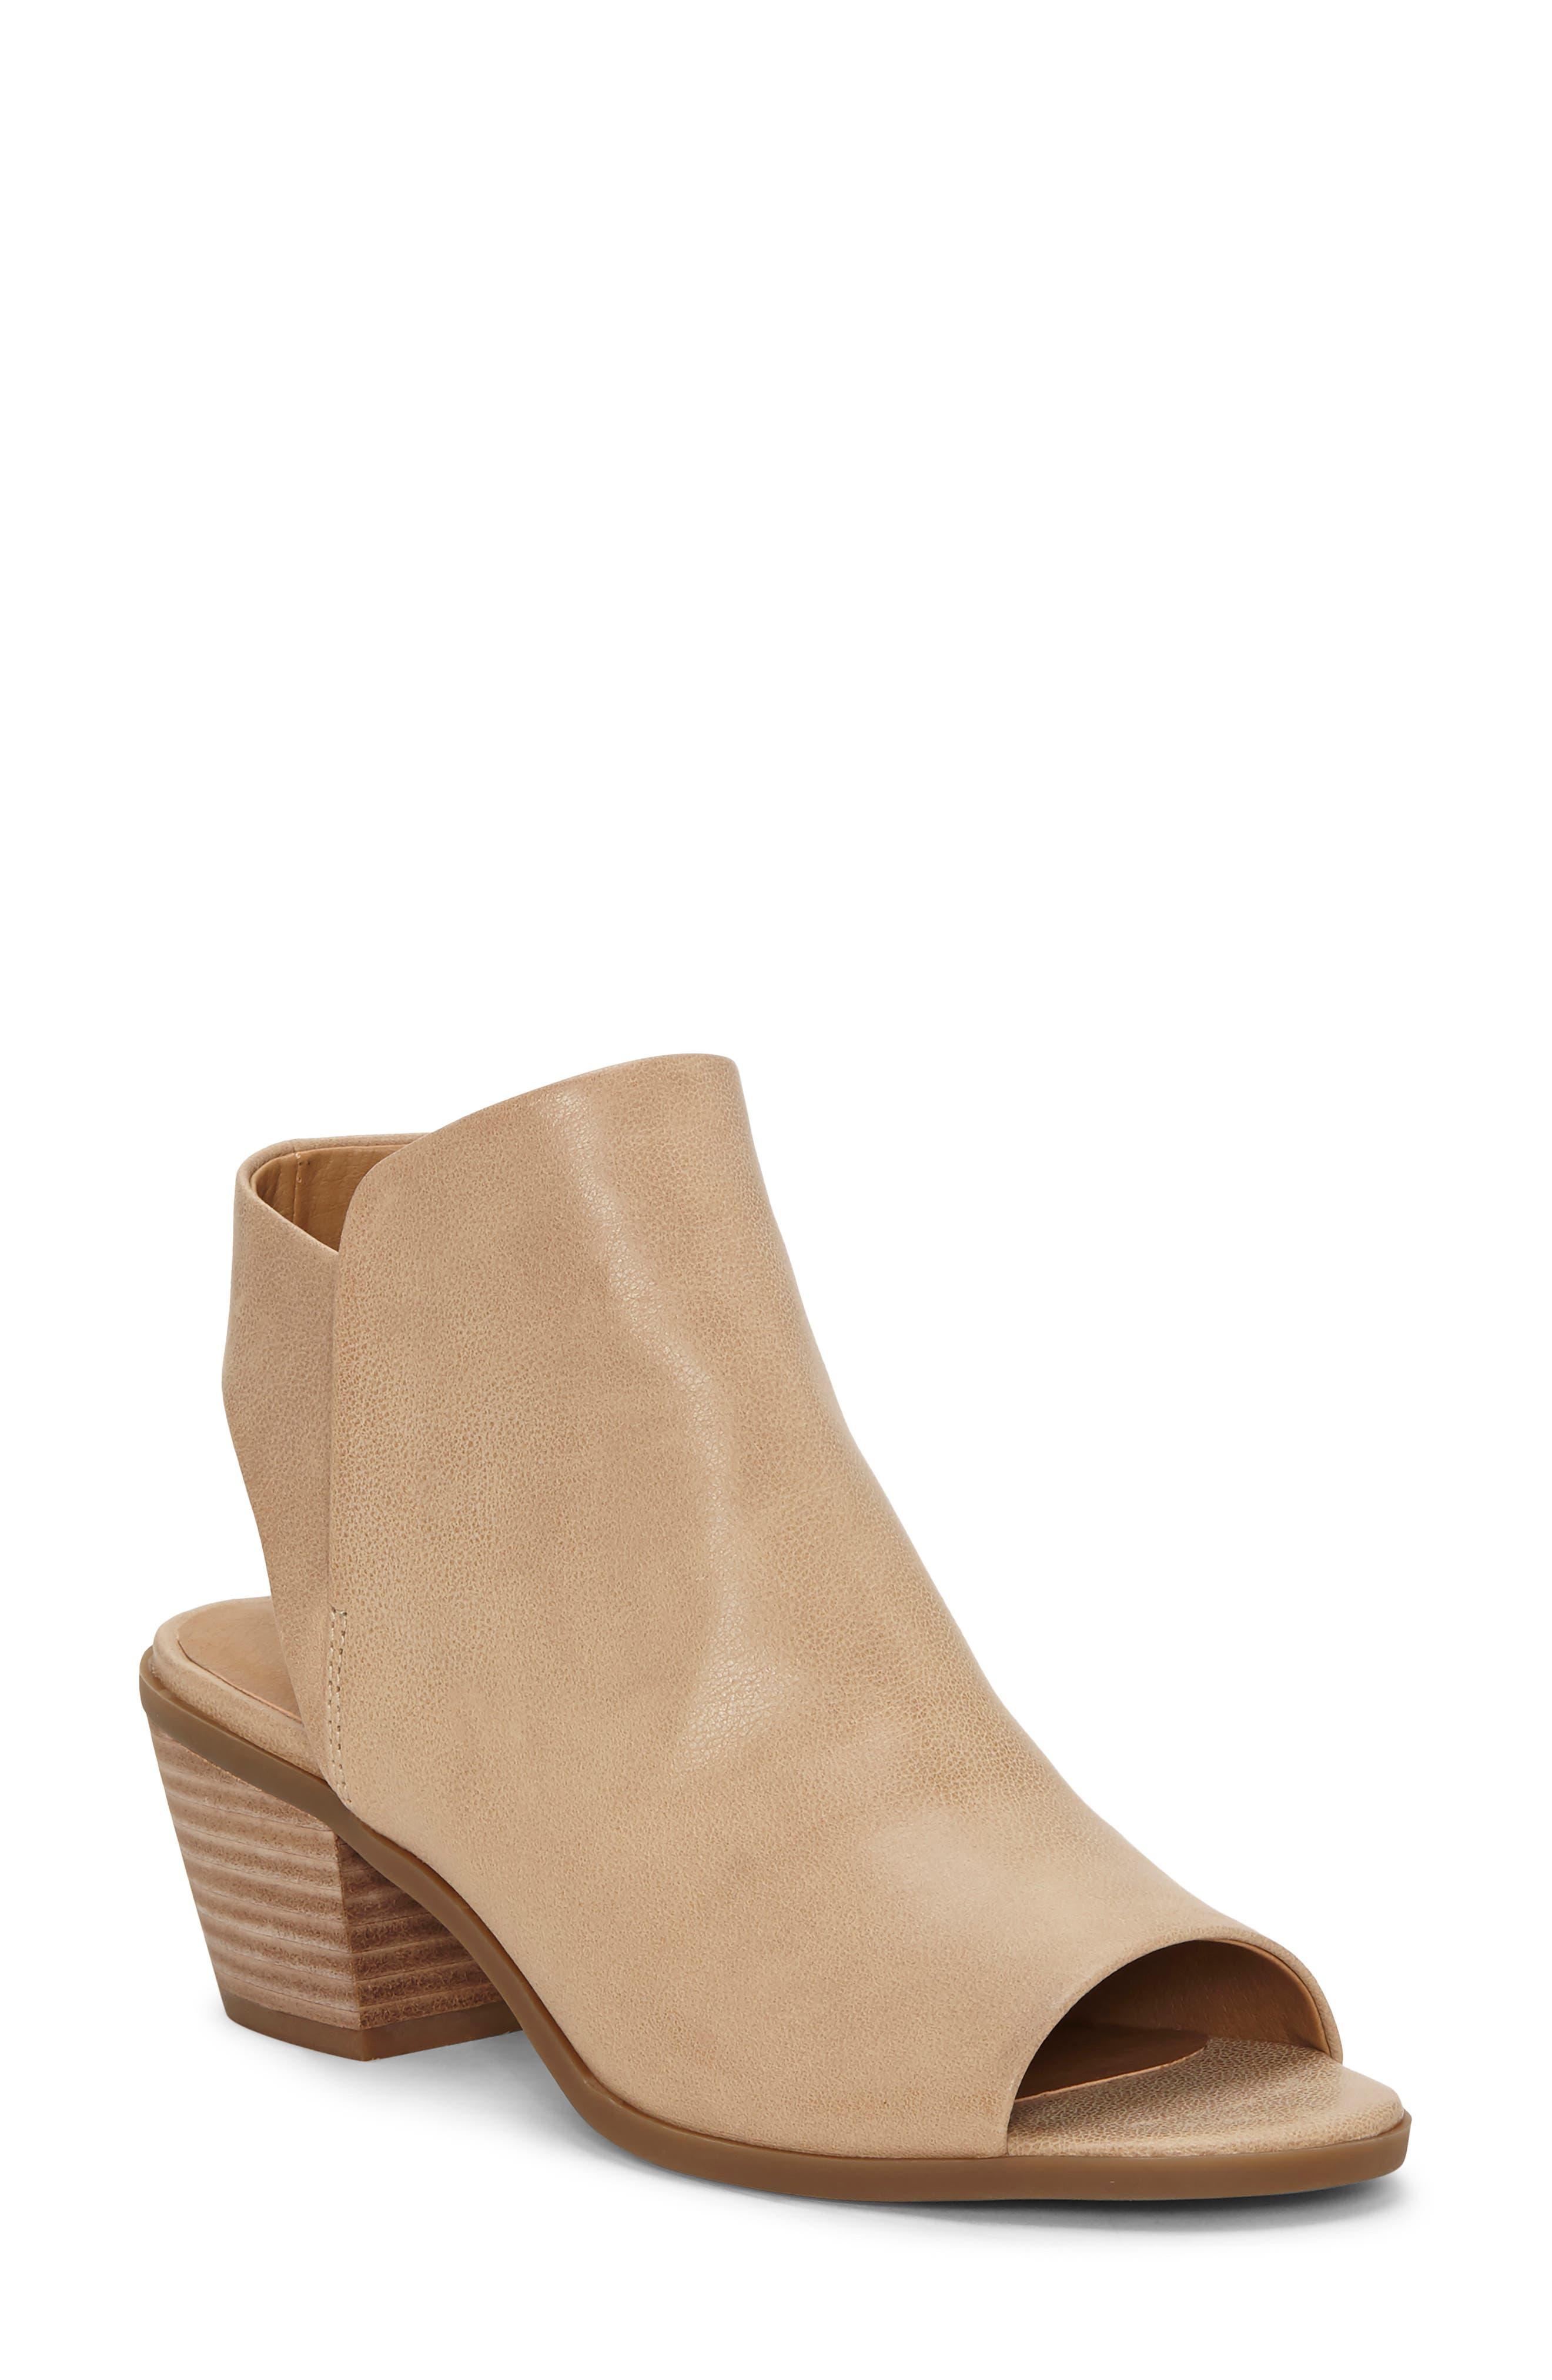 Lucky Brand Baaka Shield Sandal- Beige